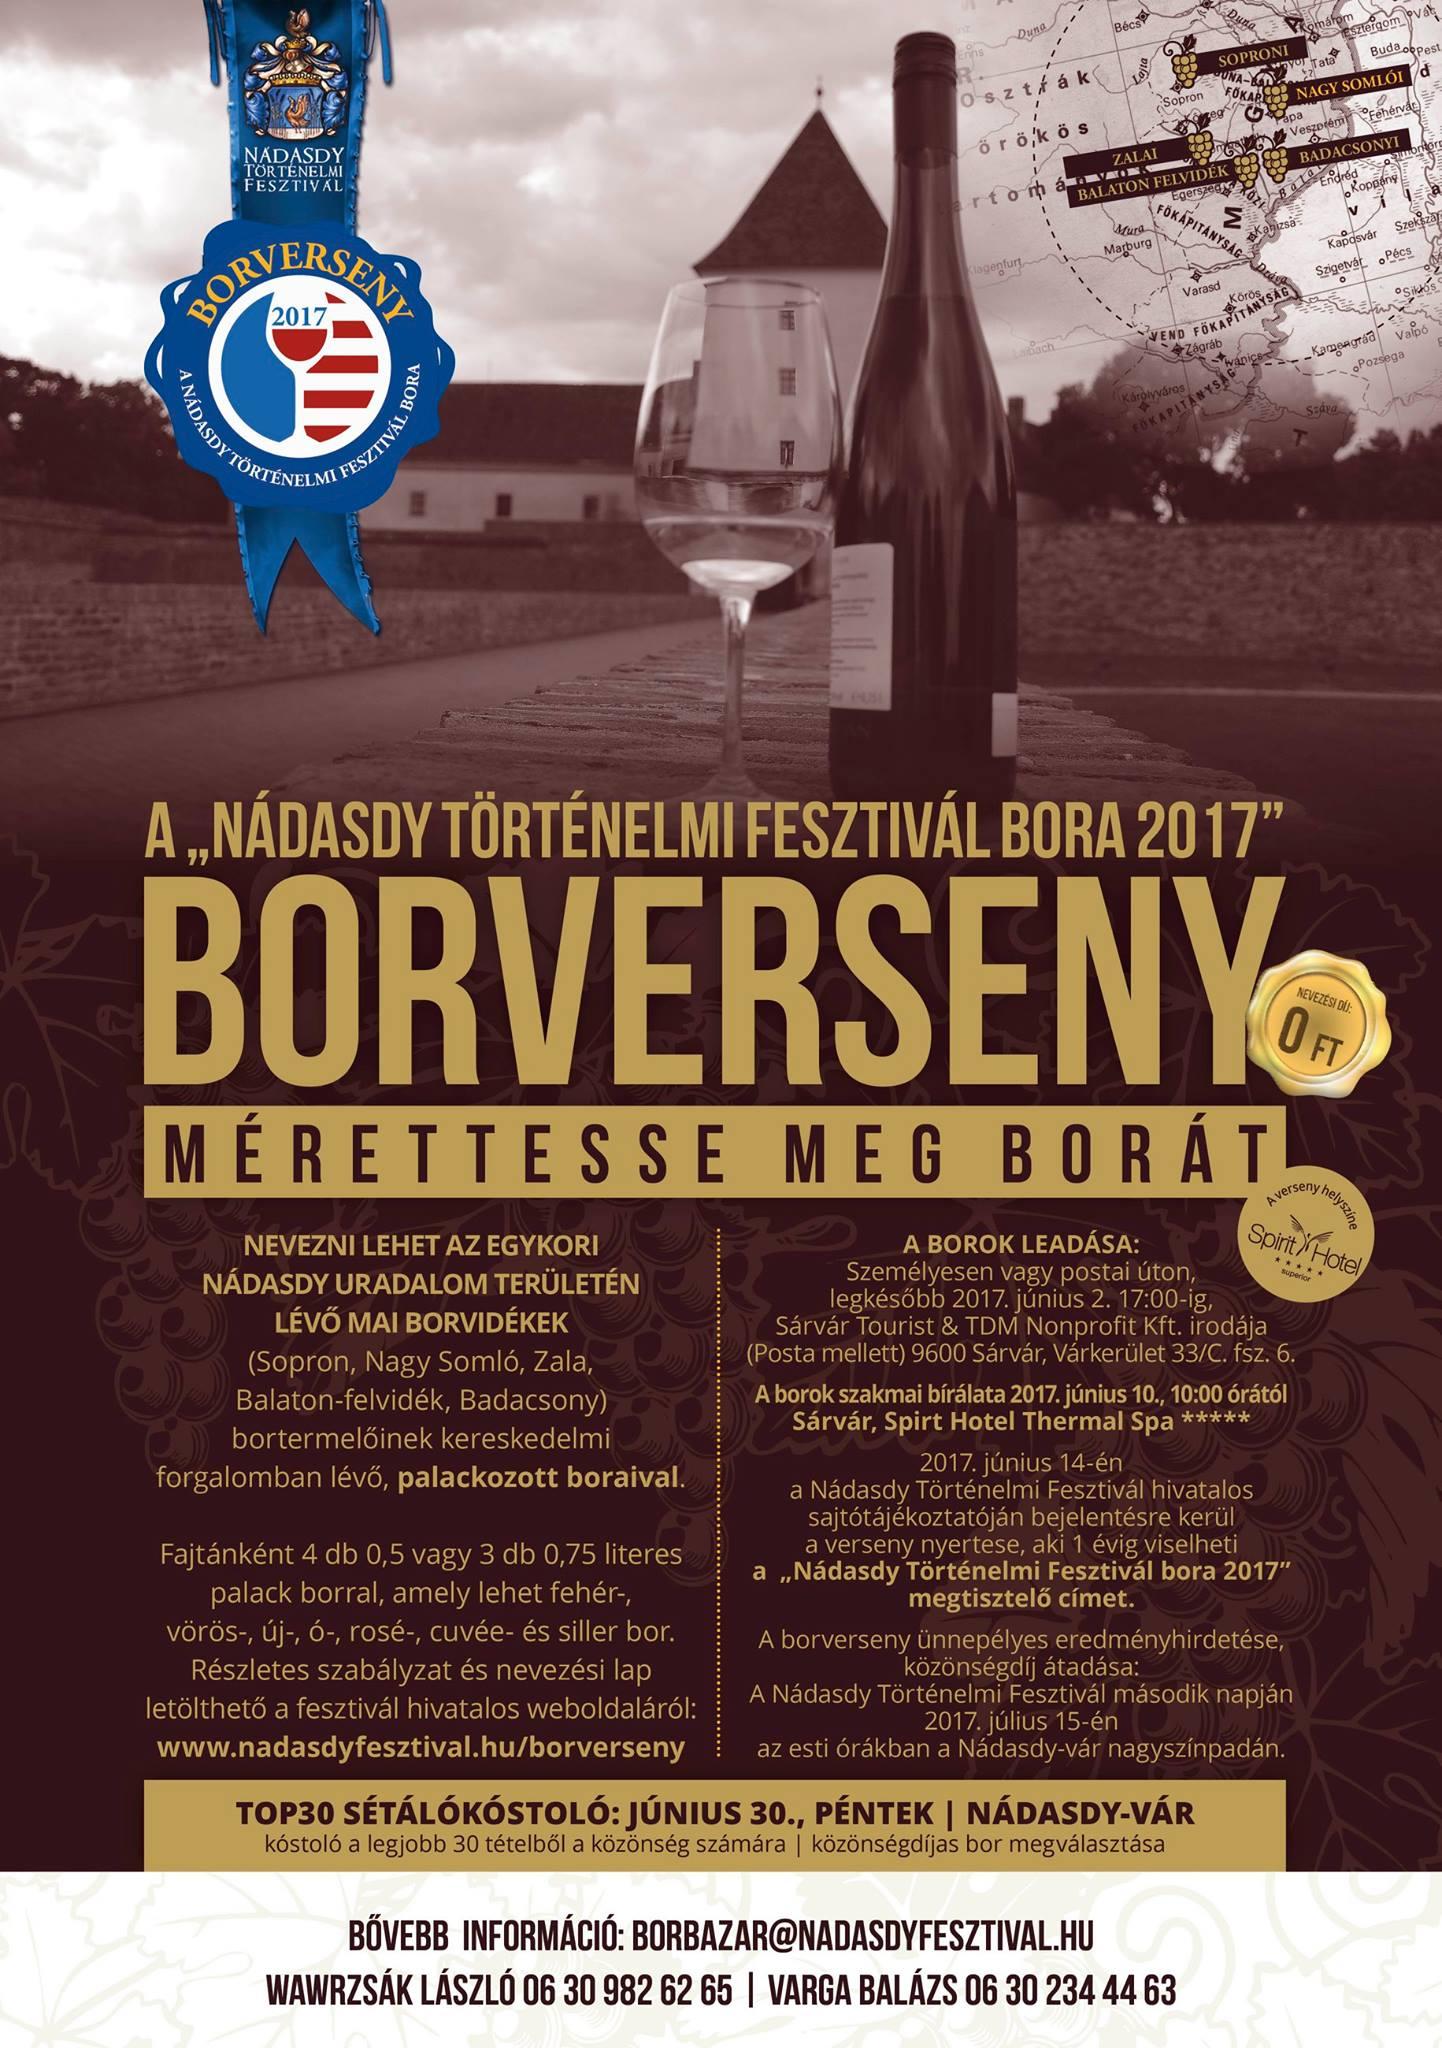 nádasdy_borverseny